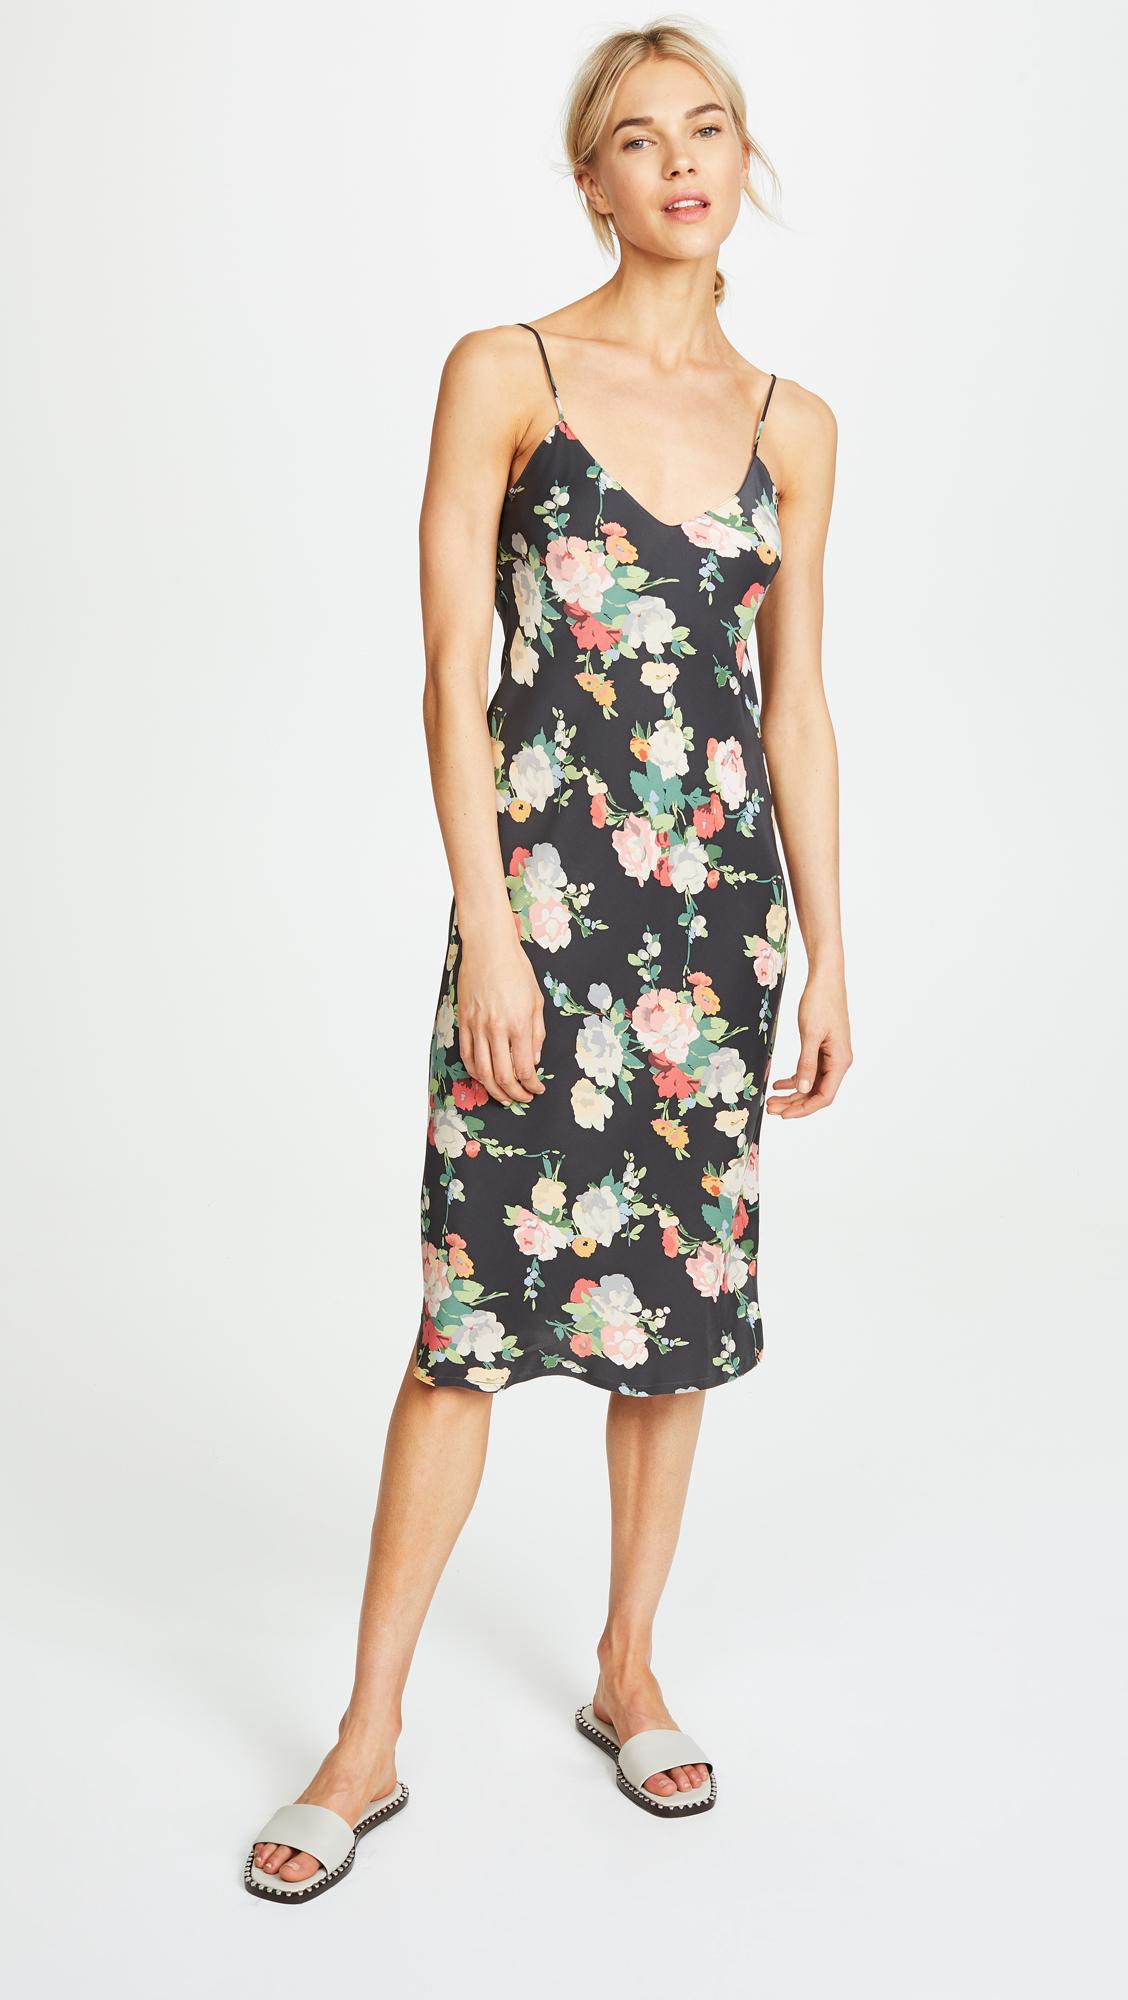 c0872604d800 Nili Lotan Cami Dress | SHOPBOP